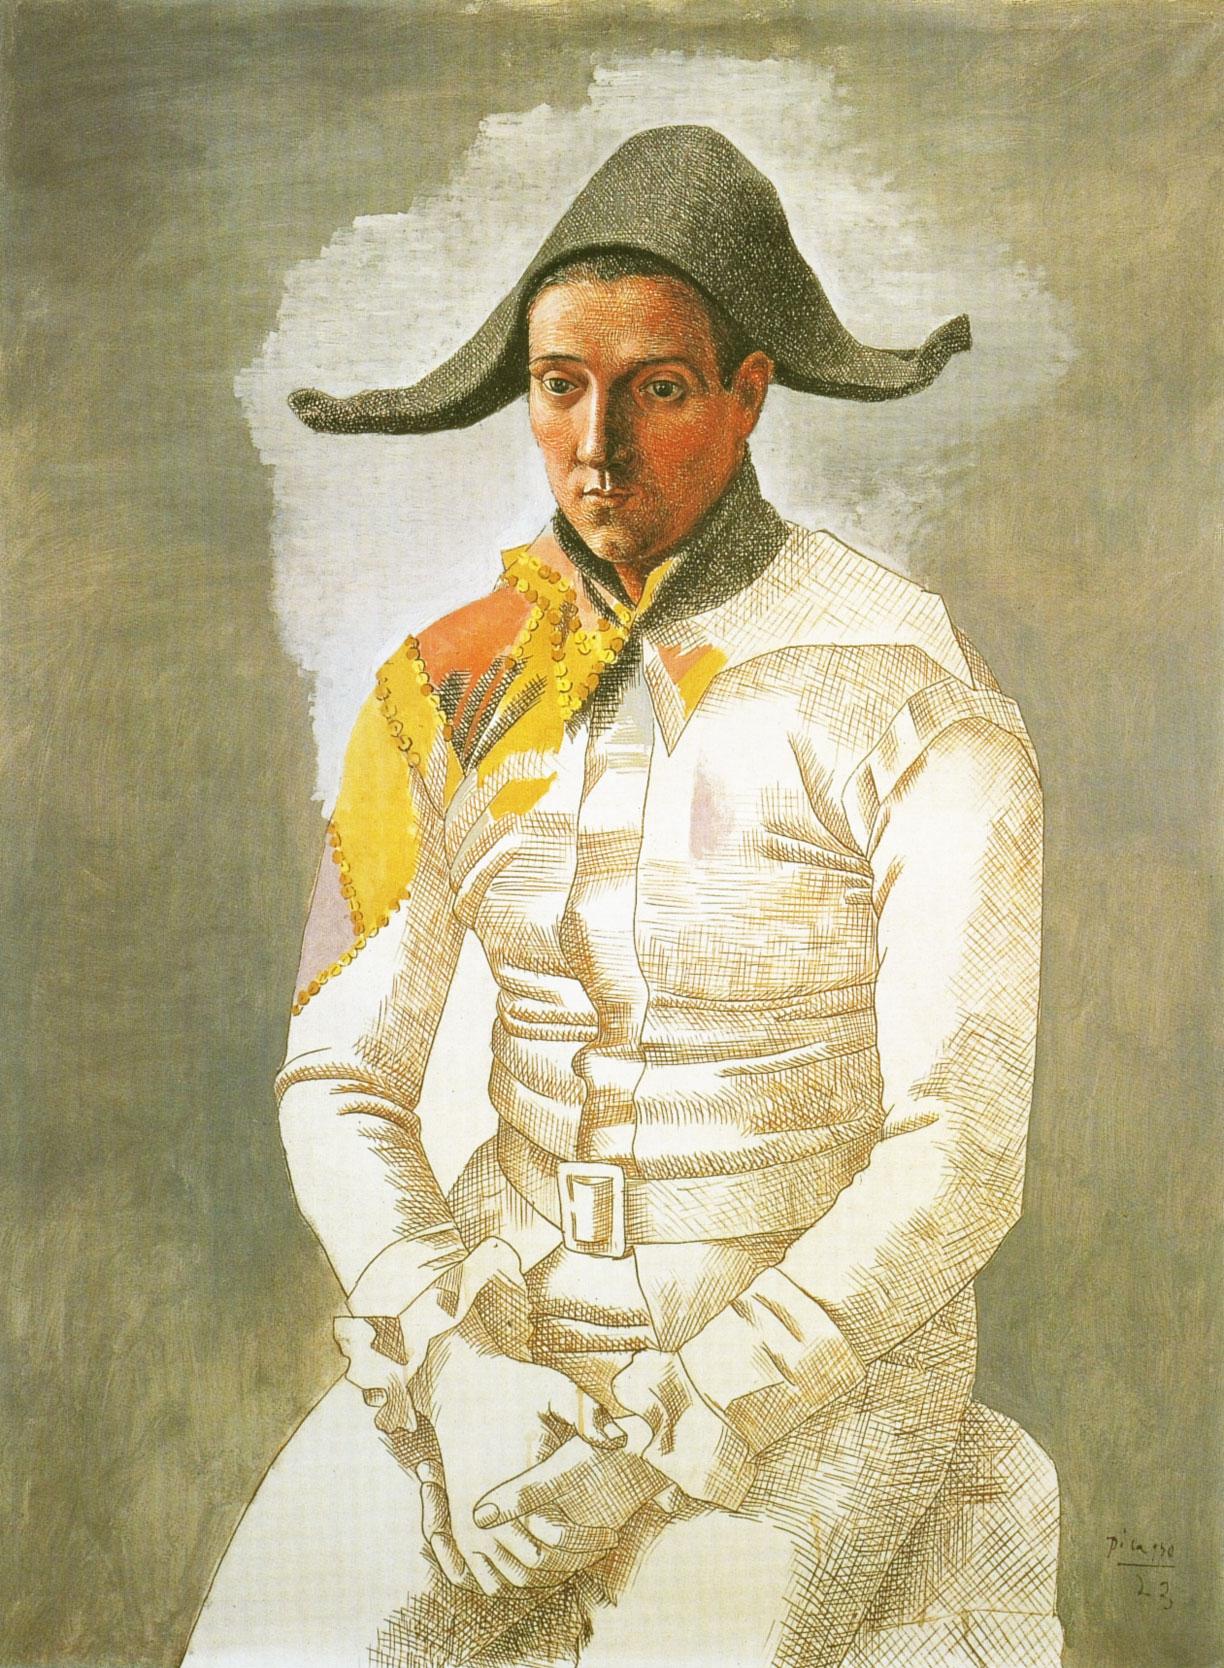 Pablo Picasso. Arlequin (Le-peintre-Salvado) 1923